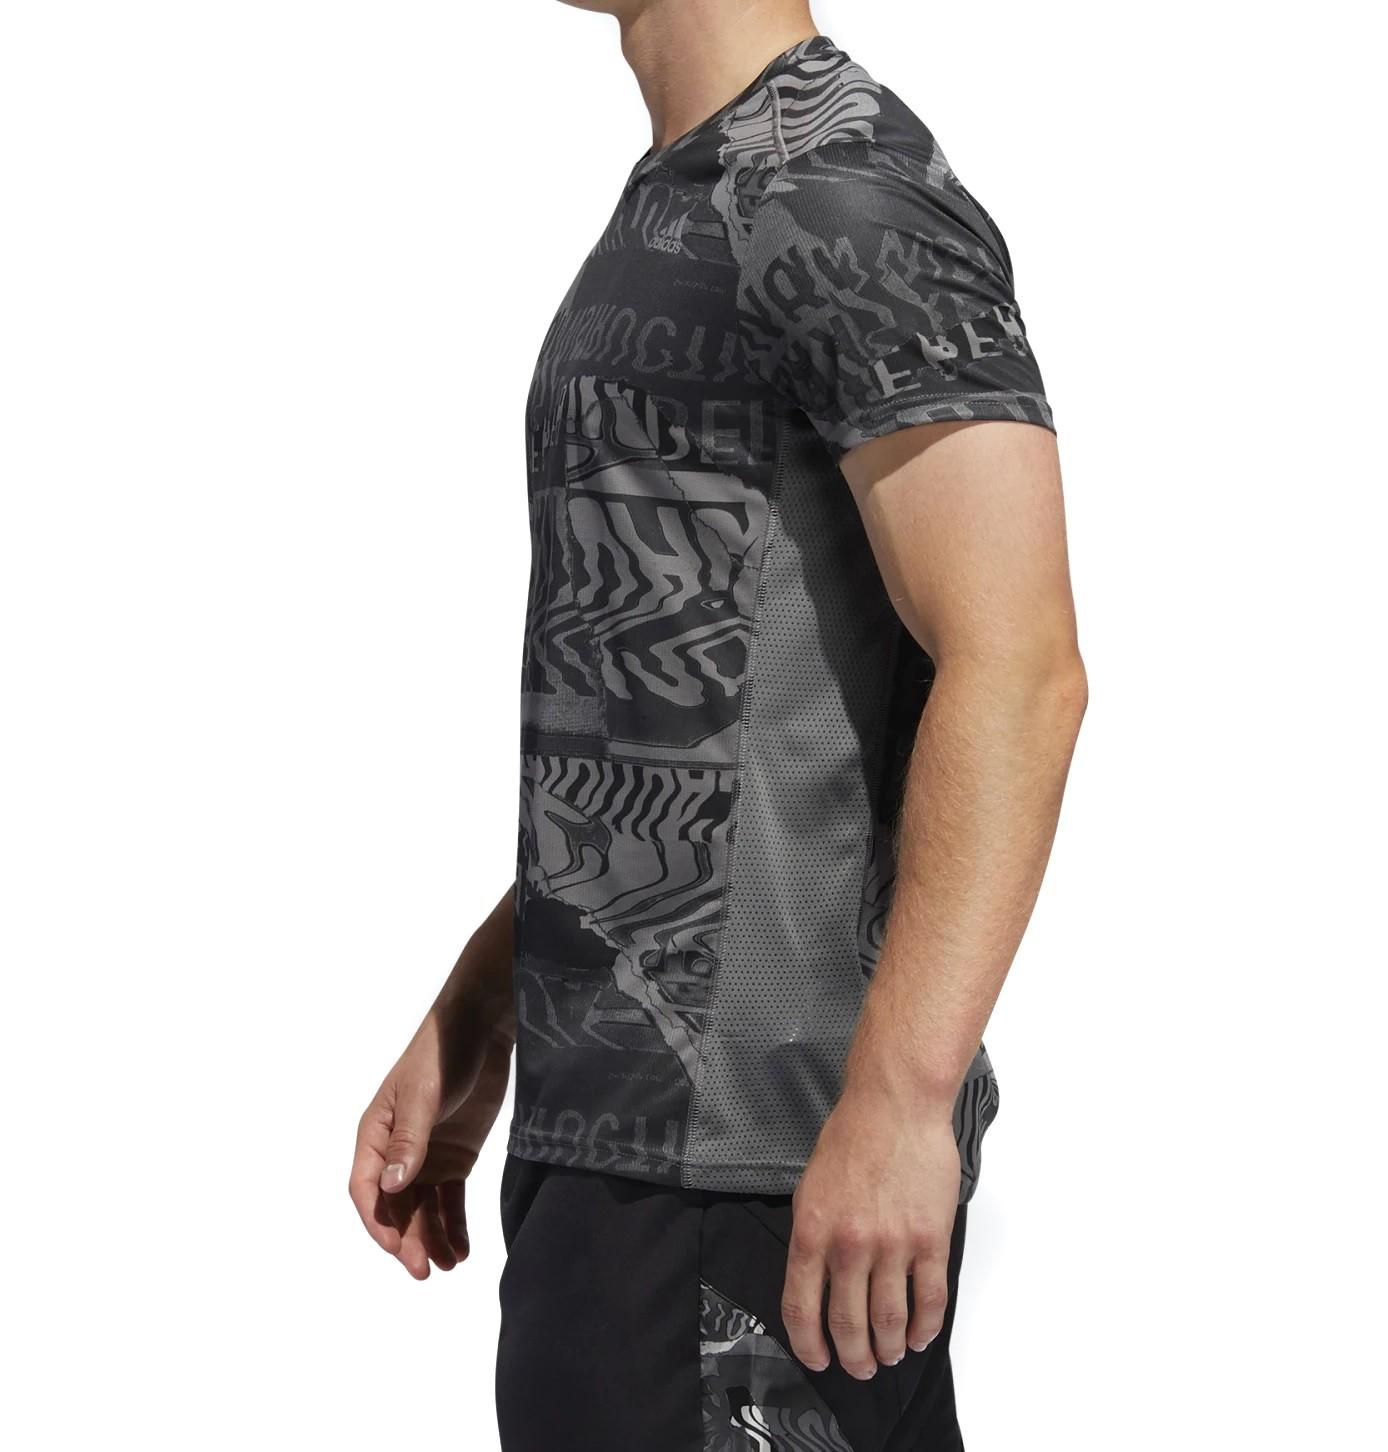 Camiseta Adidas Own The Run Masculina Preto e Cinza